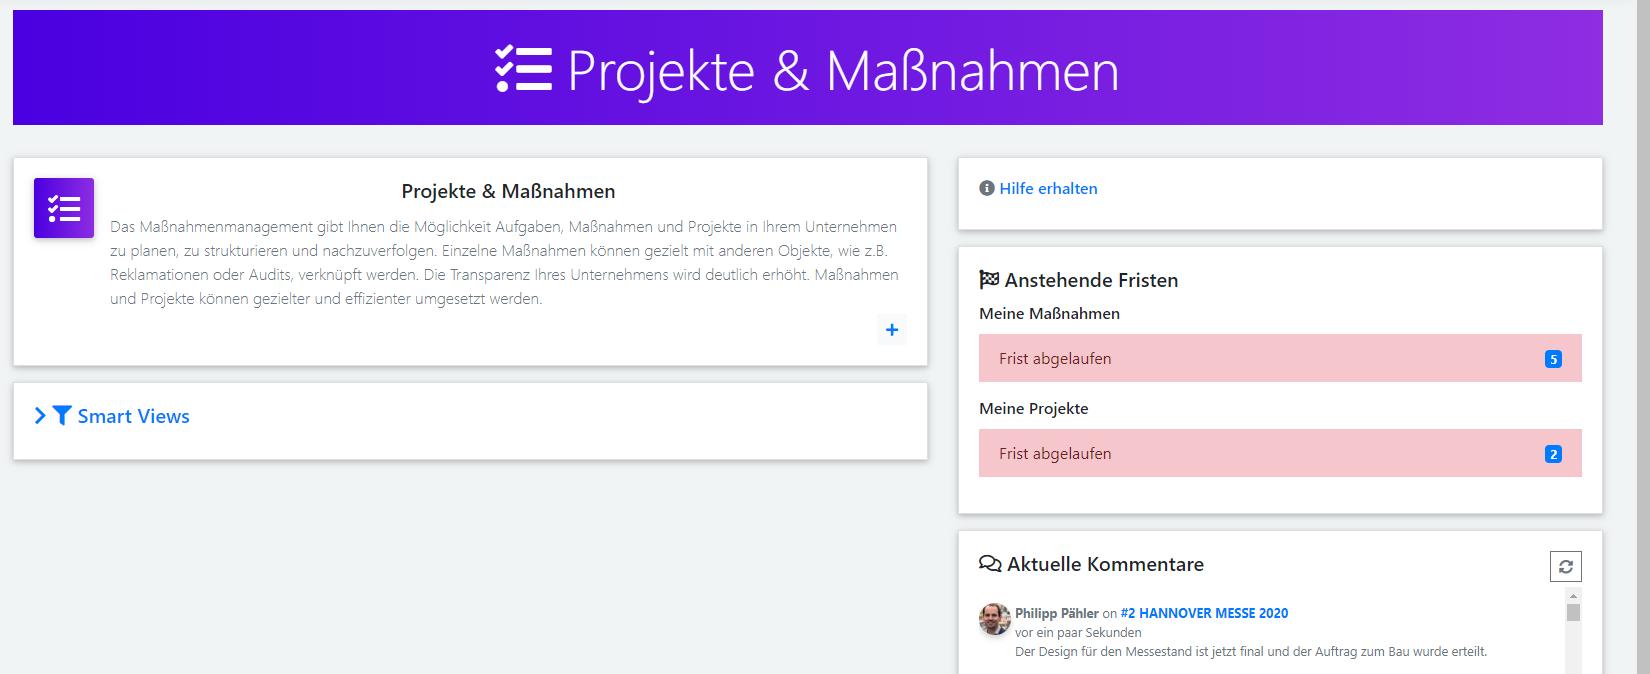 qmBase Software App Projekte und Maßnahmen